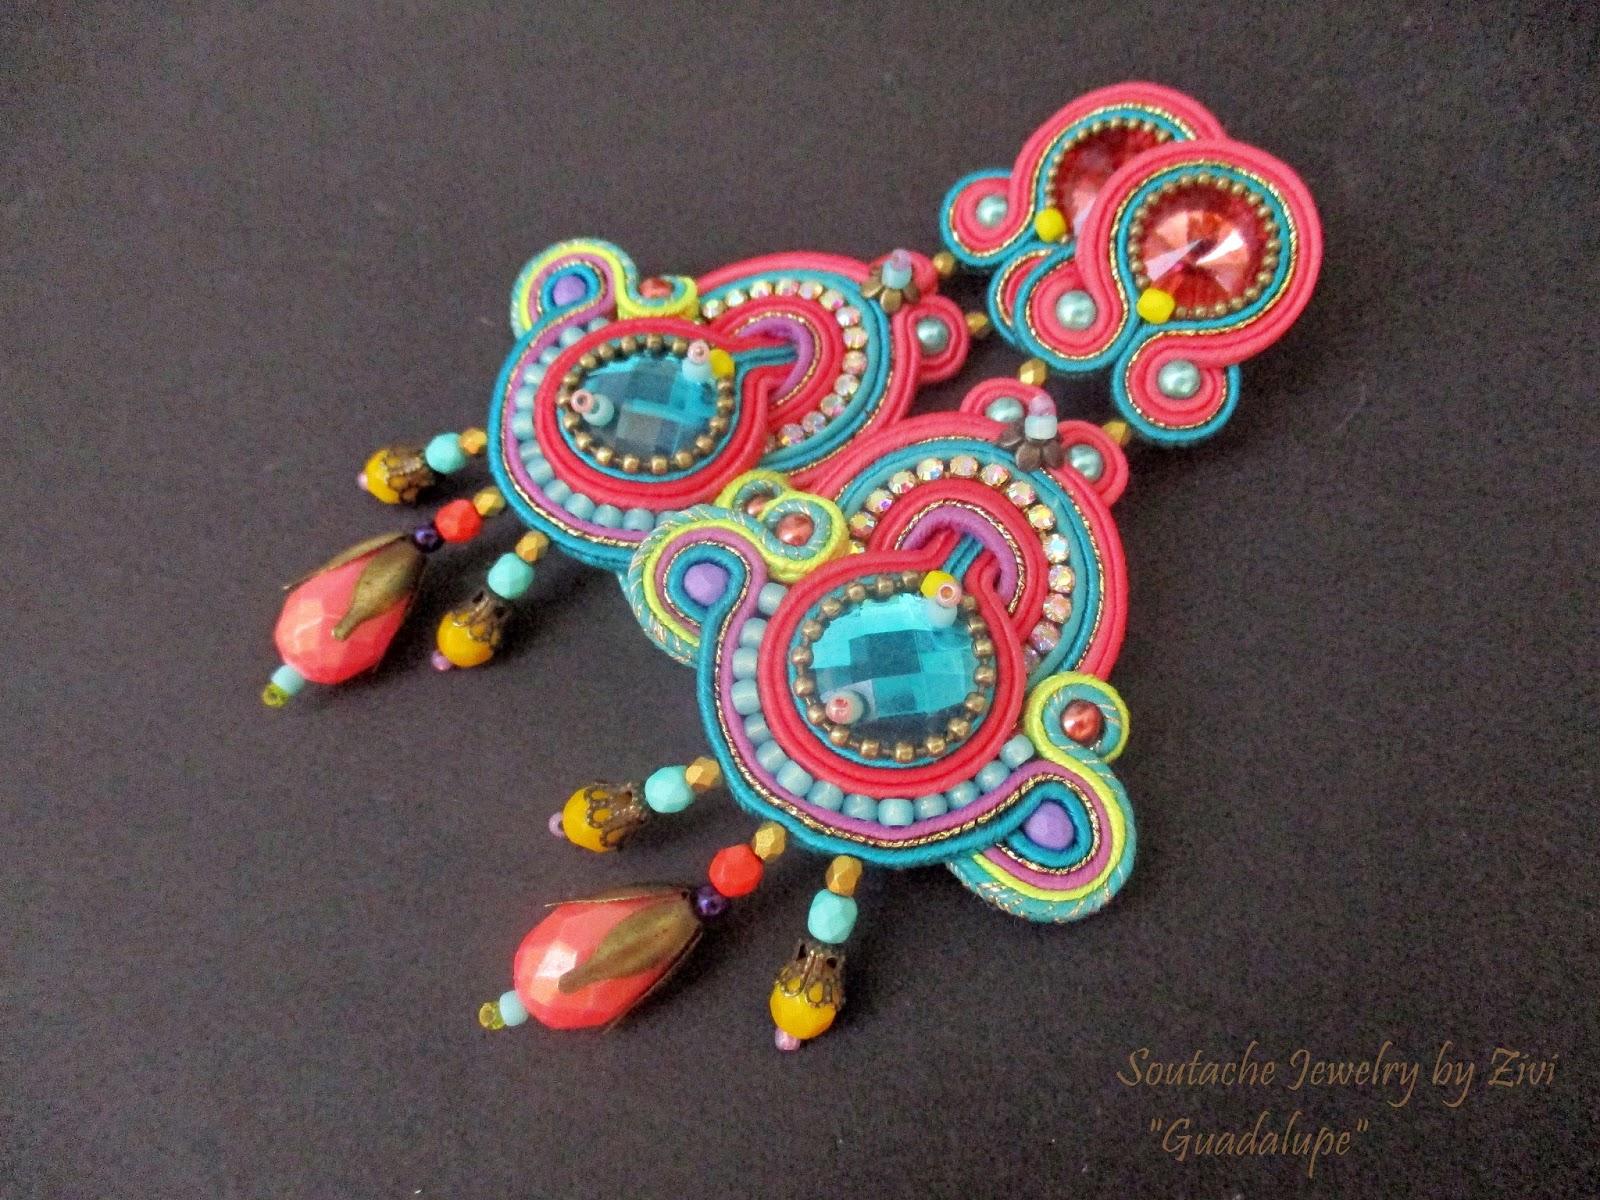 6d14254f6c77 Un modelo de pendientes de soutache largos y coloridos perfecto para traje  de flamenca o invitada a boda.